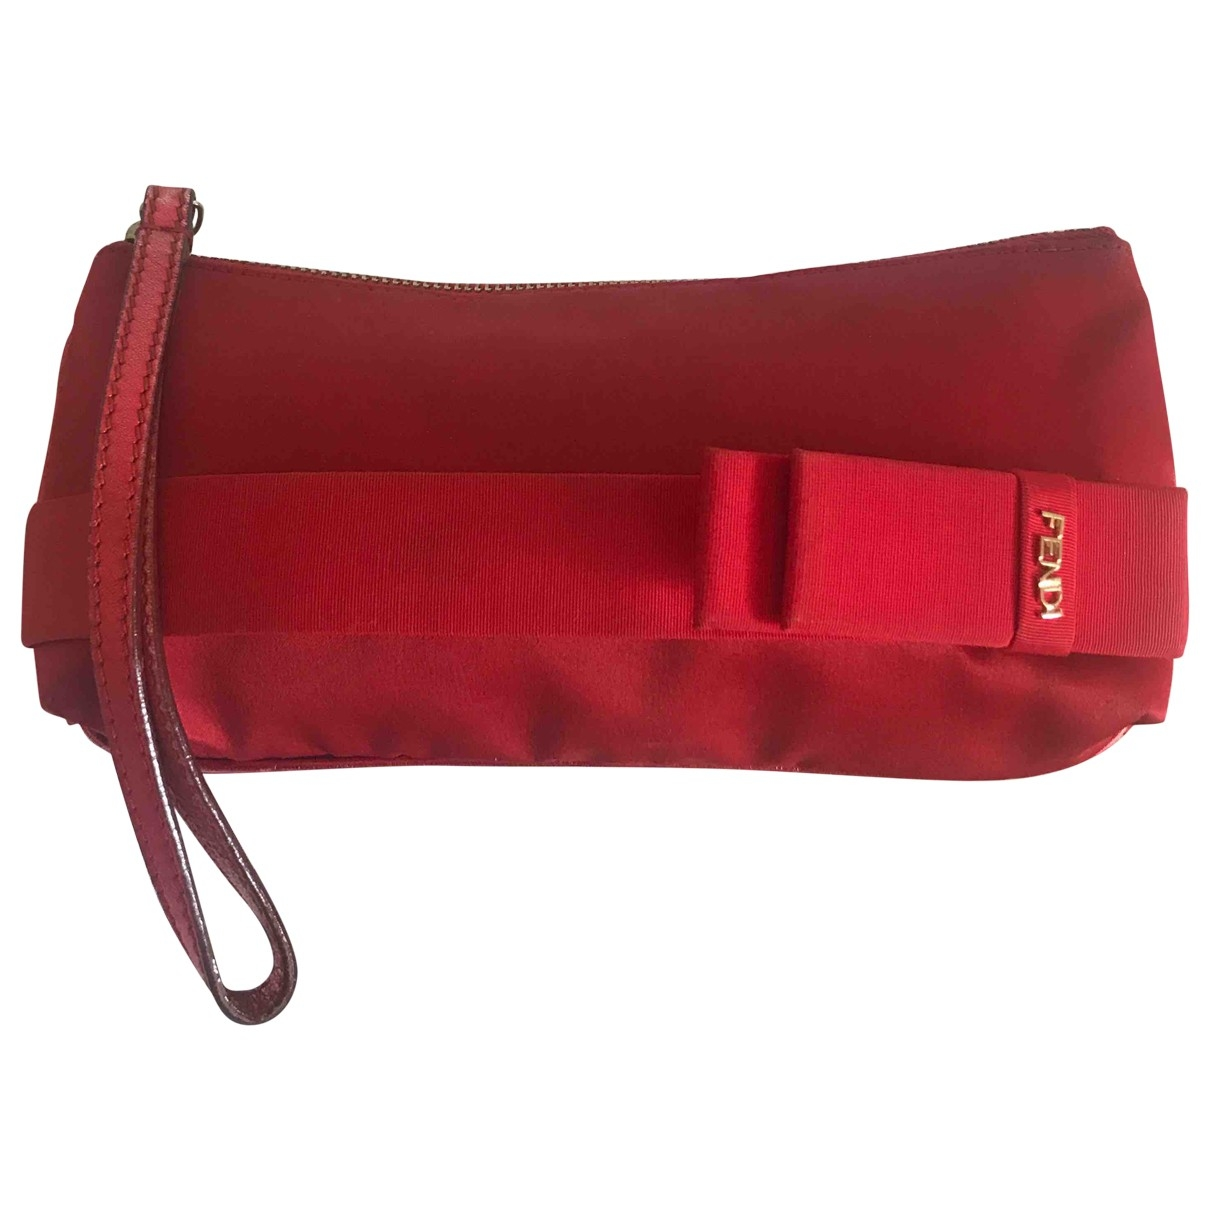 Fendi \N Red Silk Clutch bag for Women \N